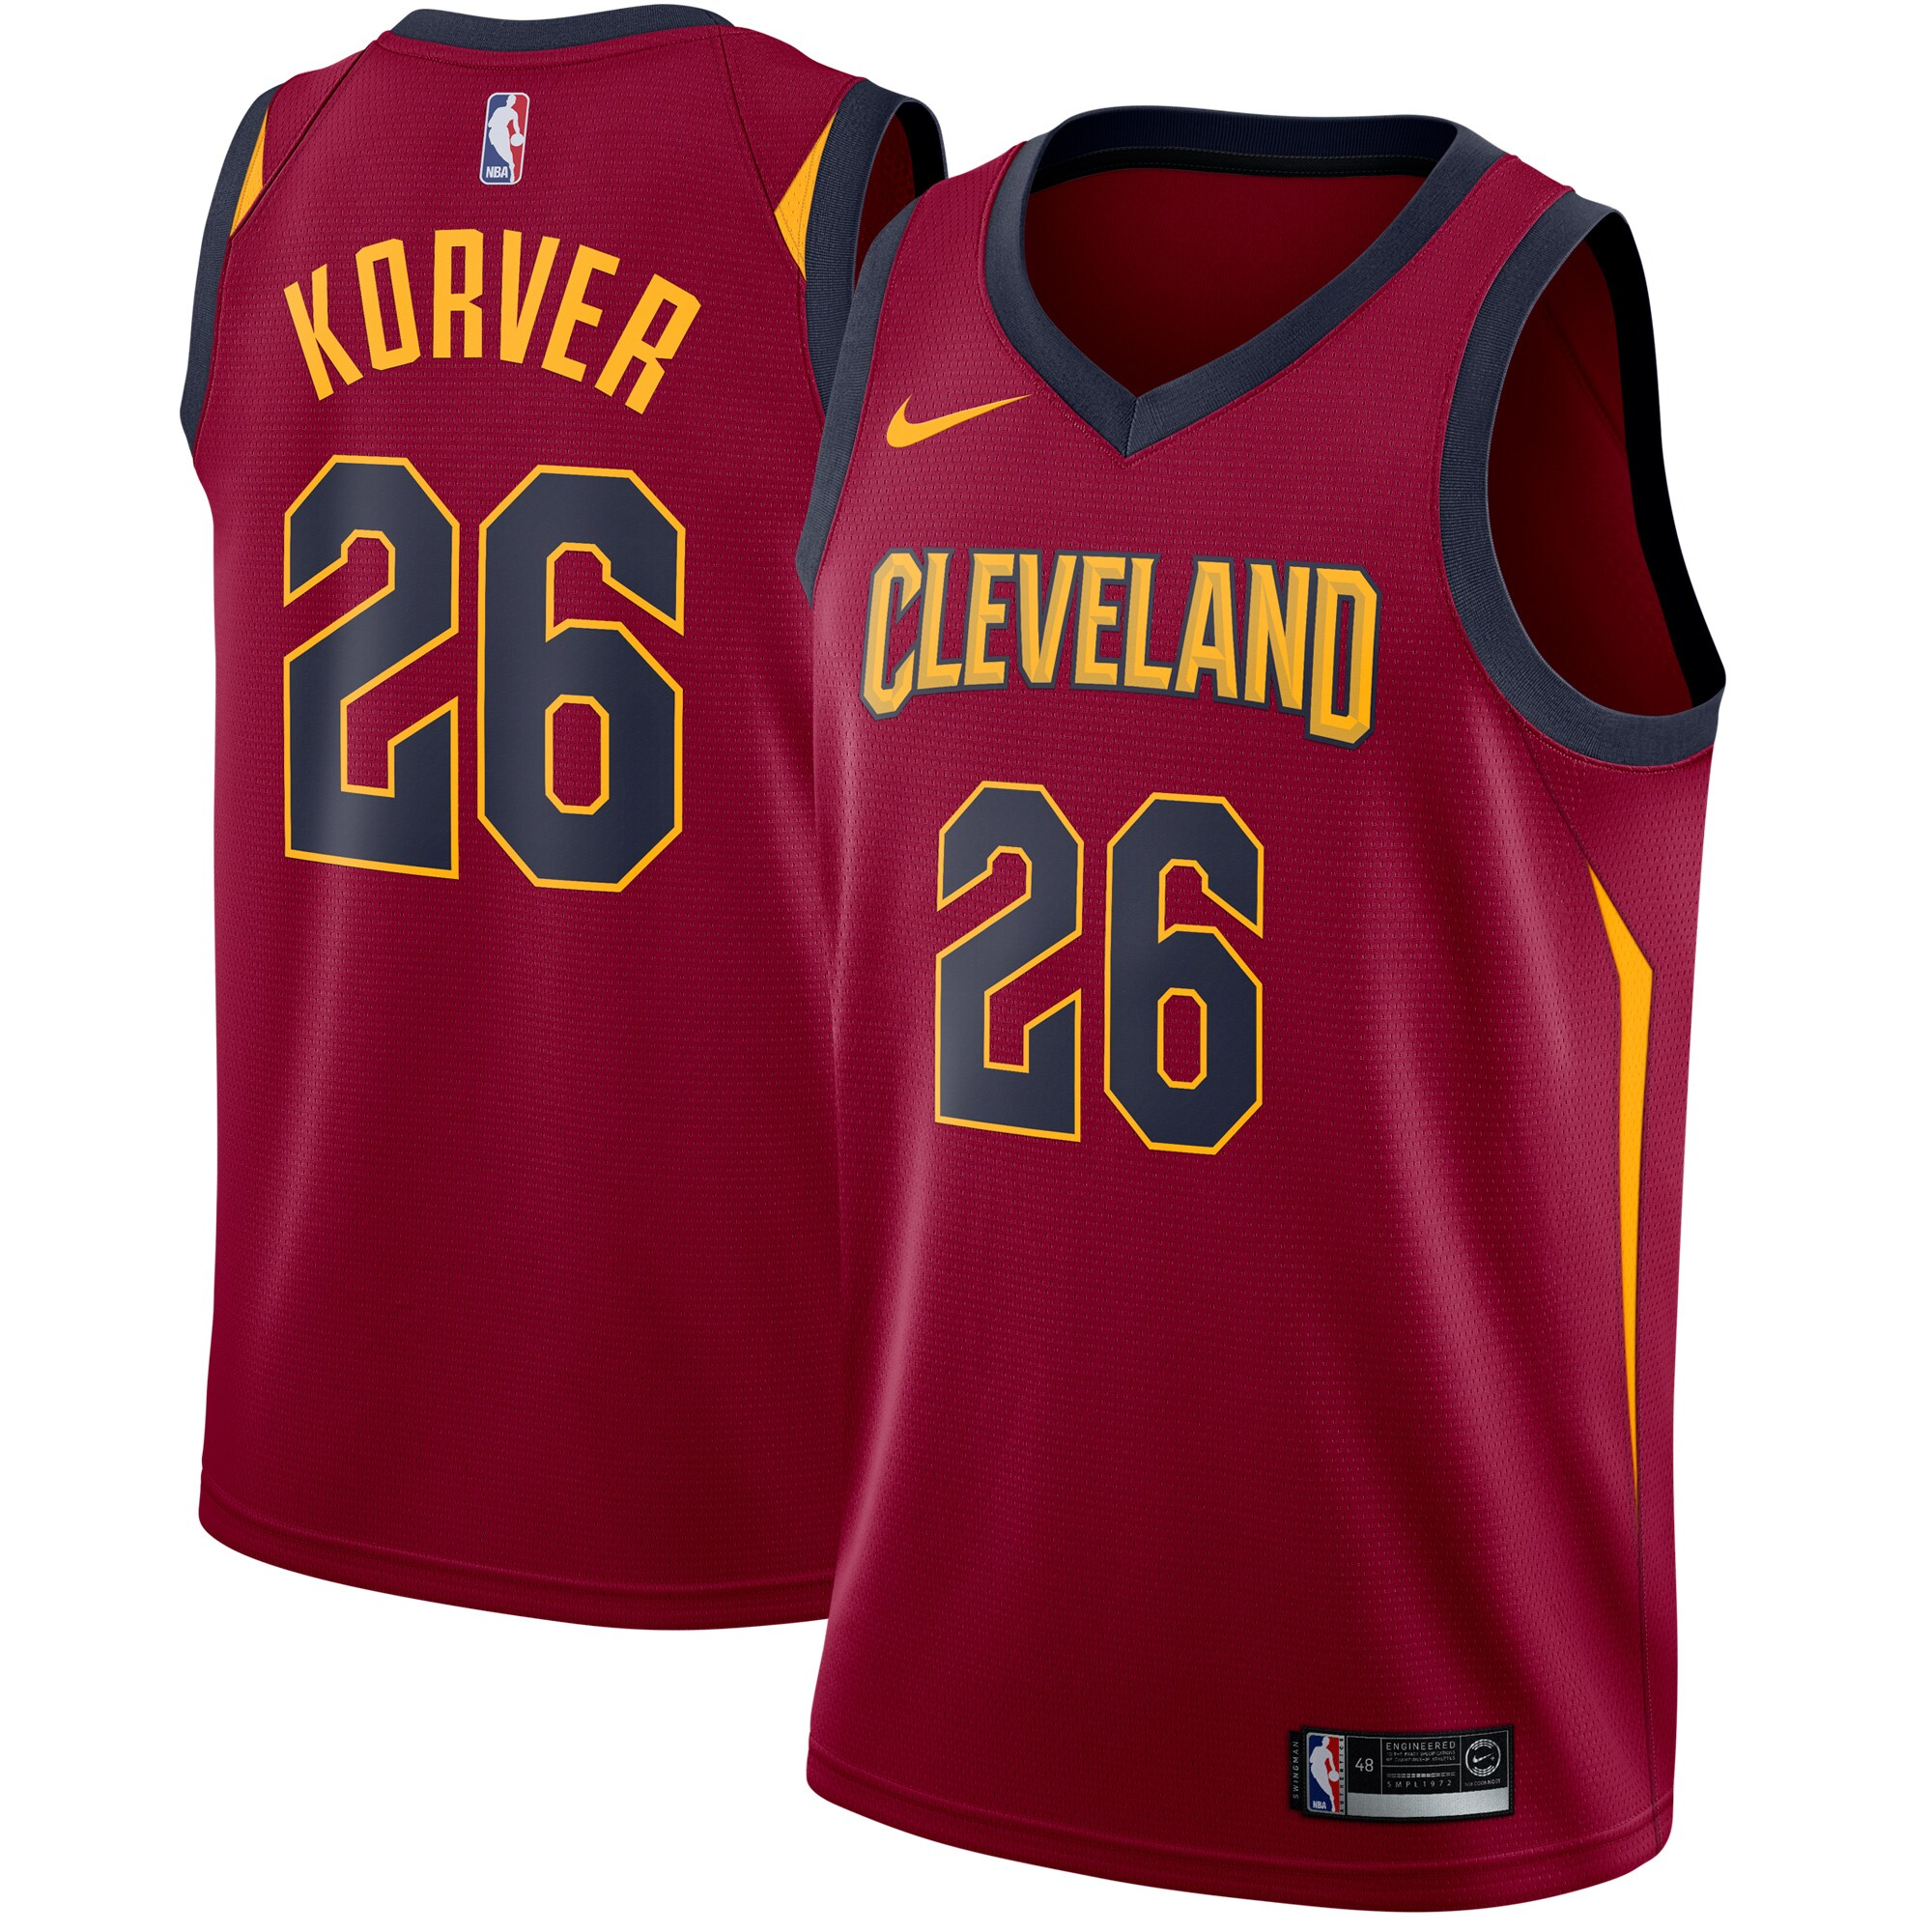 Kyle Korver Cleveland Cavaliers Nike Swingman Jersey Maroon - Icon Edition